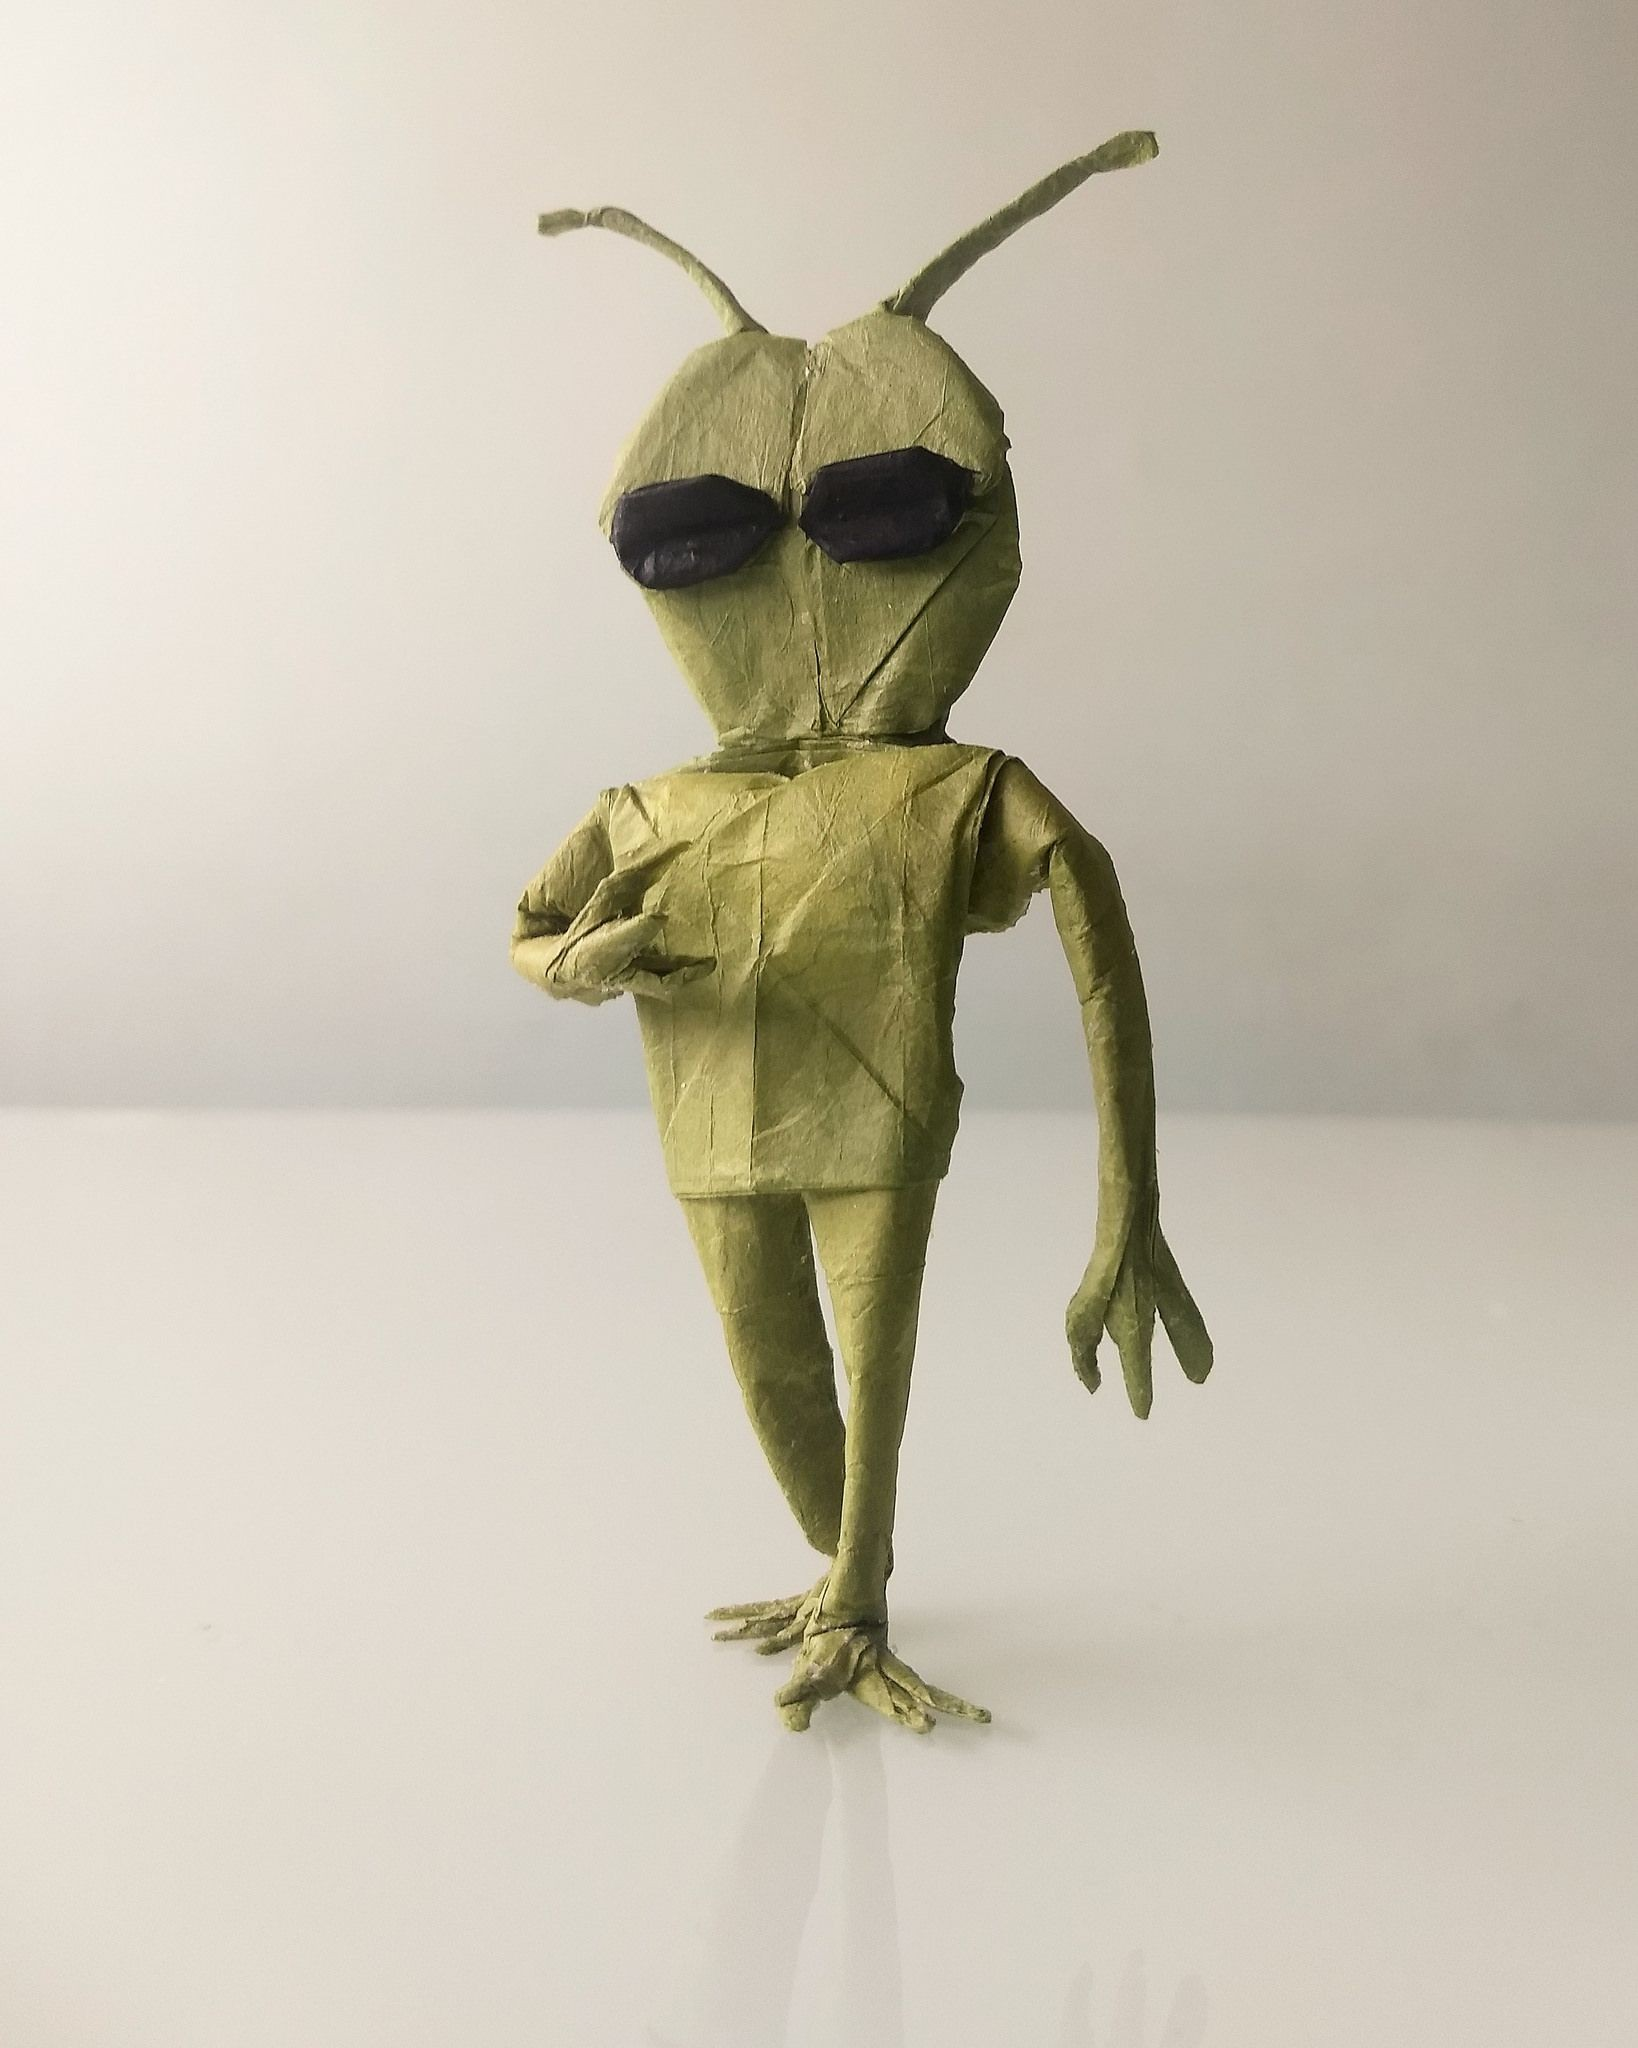 Sci Fi Papercraft Alien Damian Malicki Thai Unryu 30x30cm